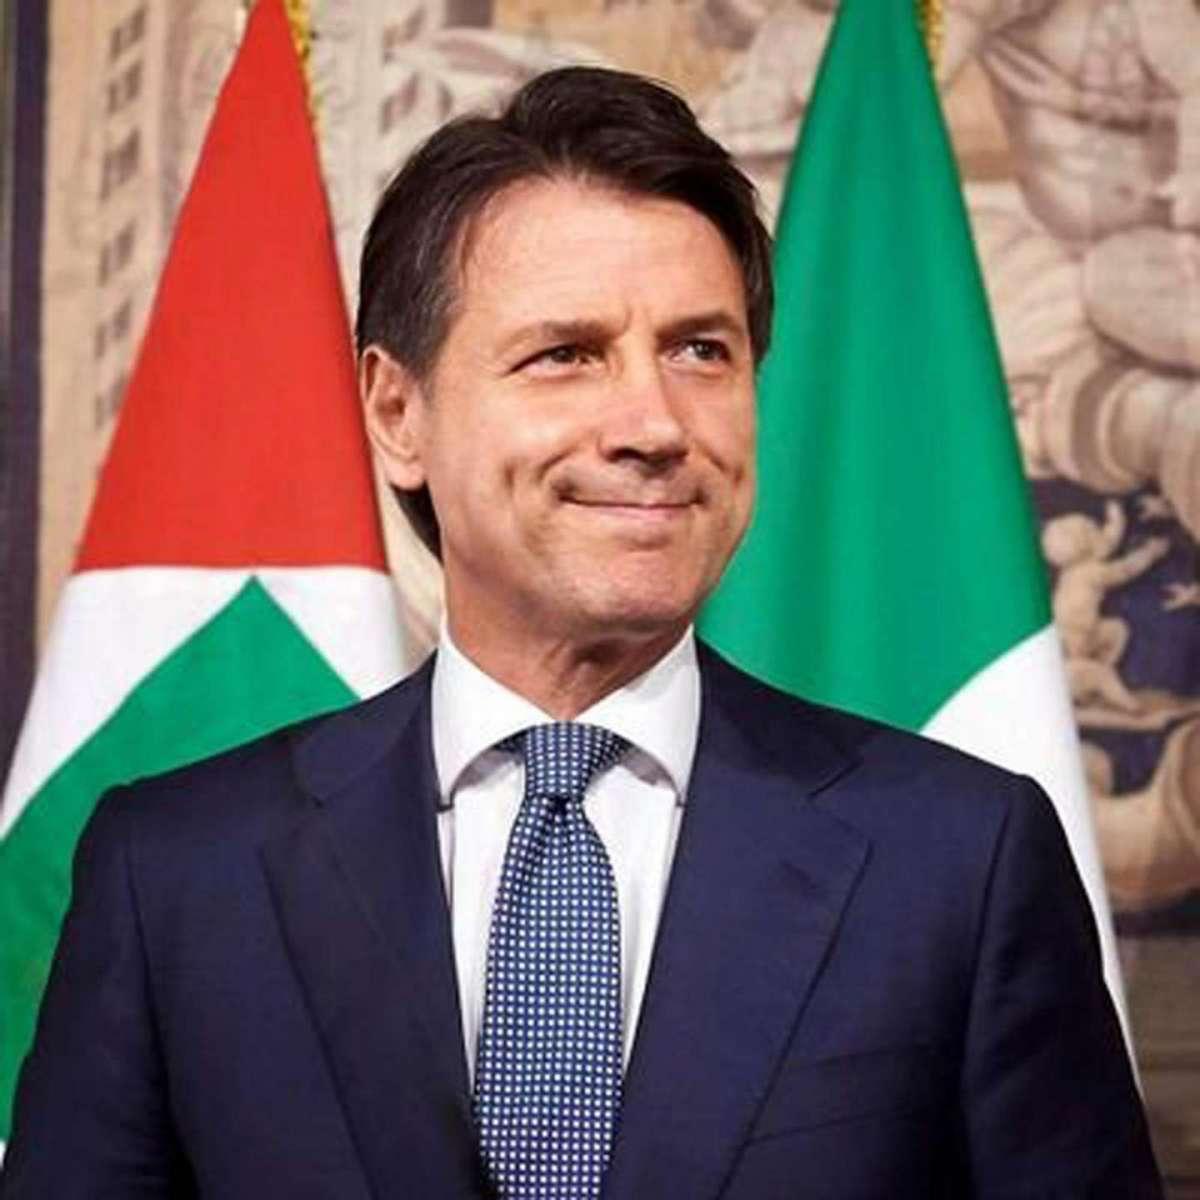 Giuseppe Conte, foto twitter